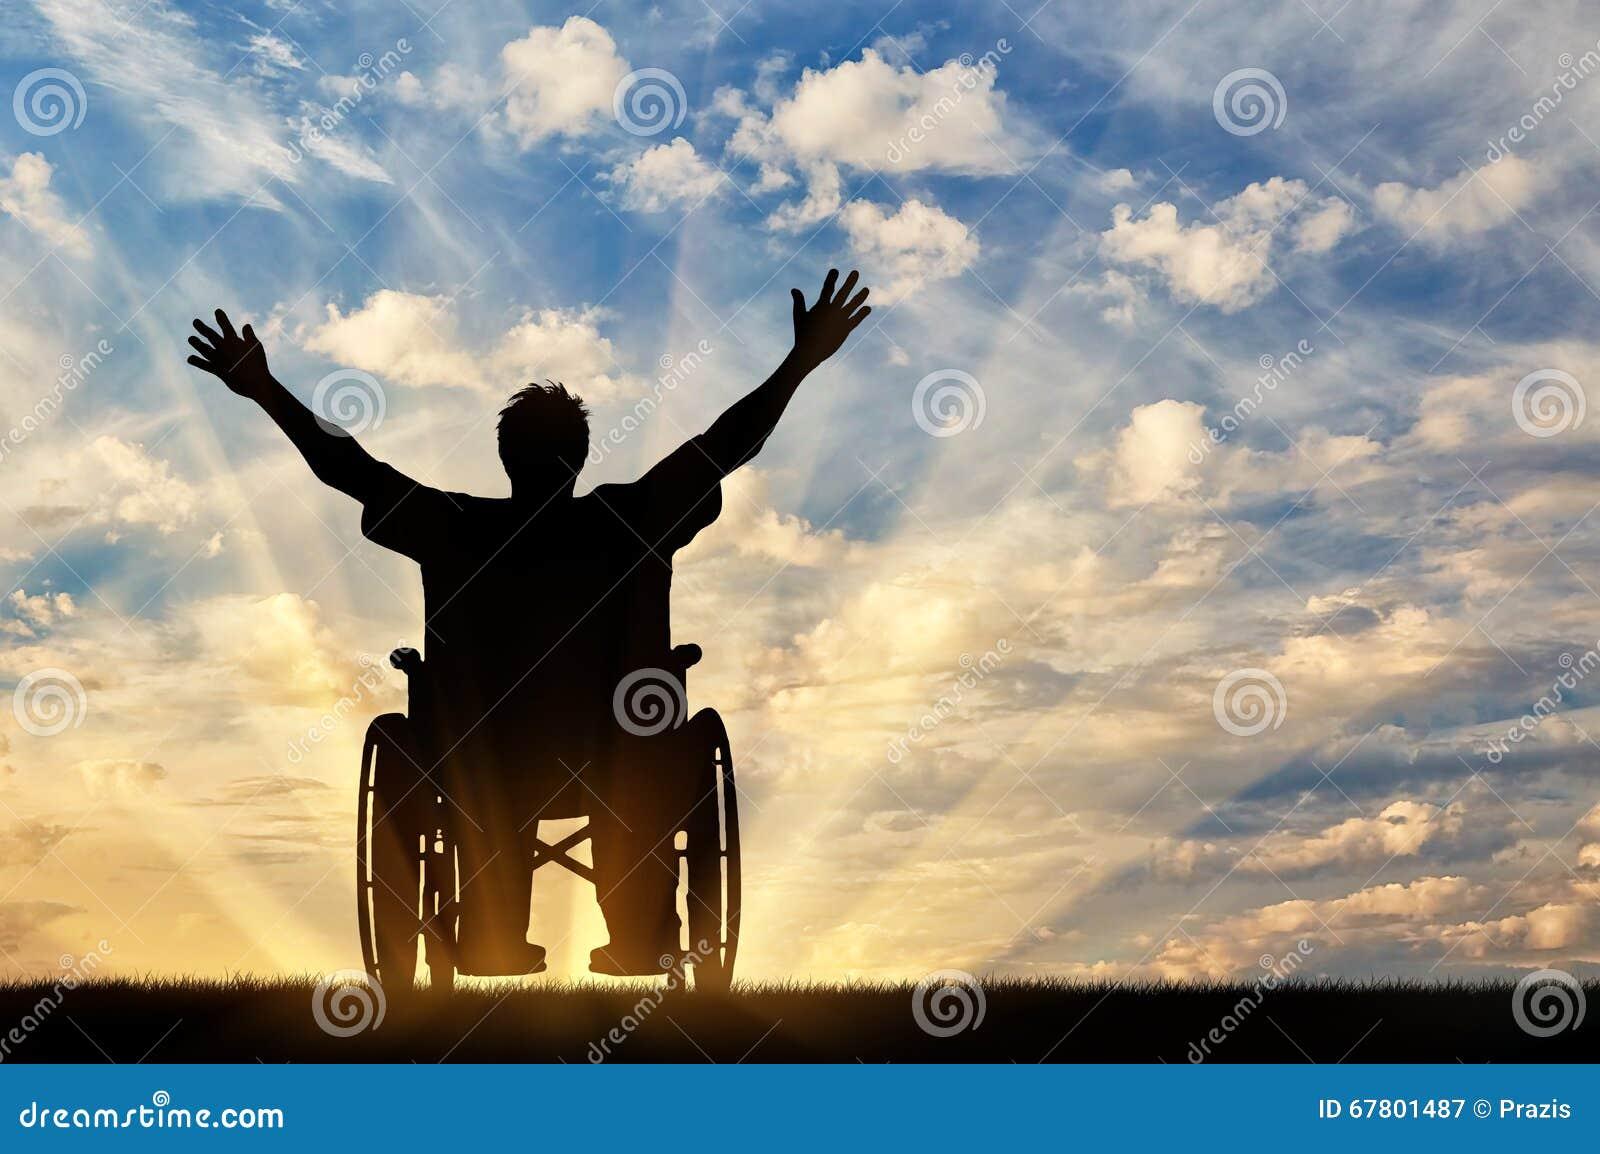 Persona discapacitada feliz de la silueta